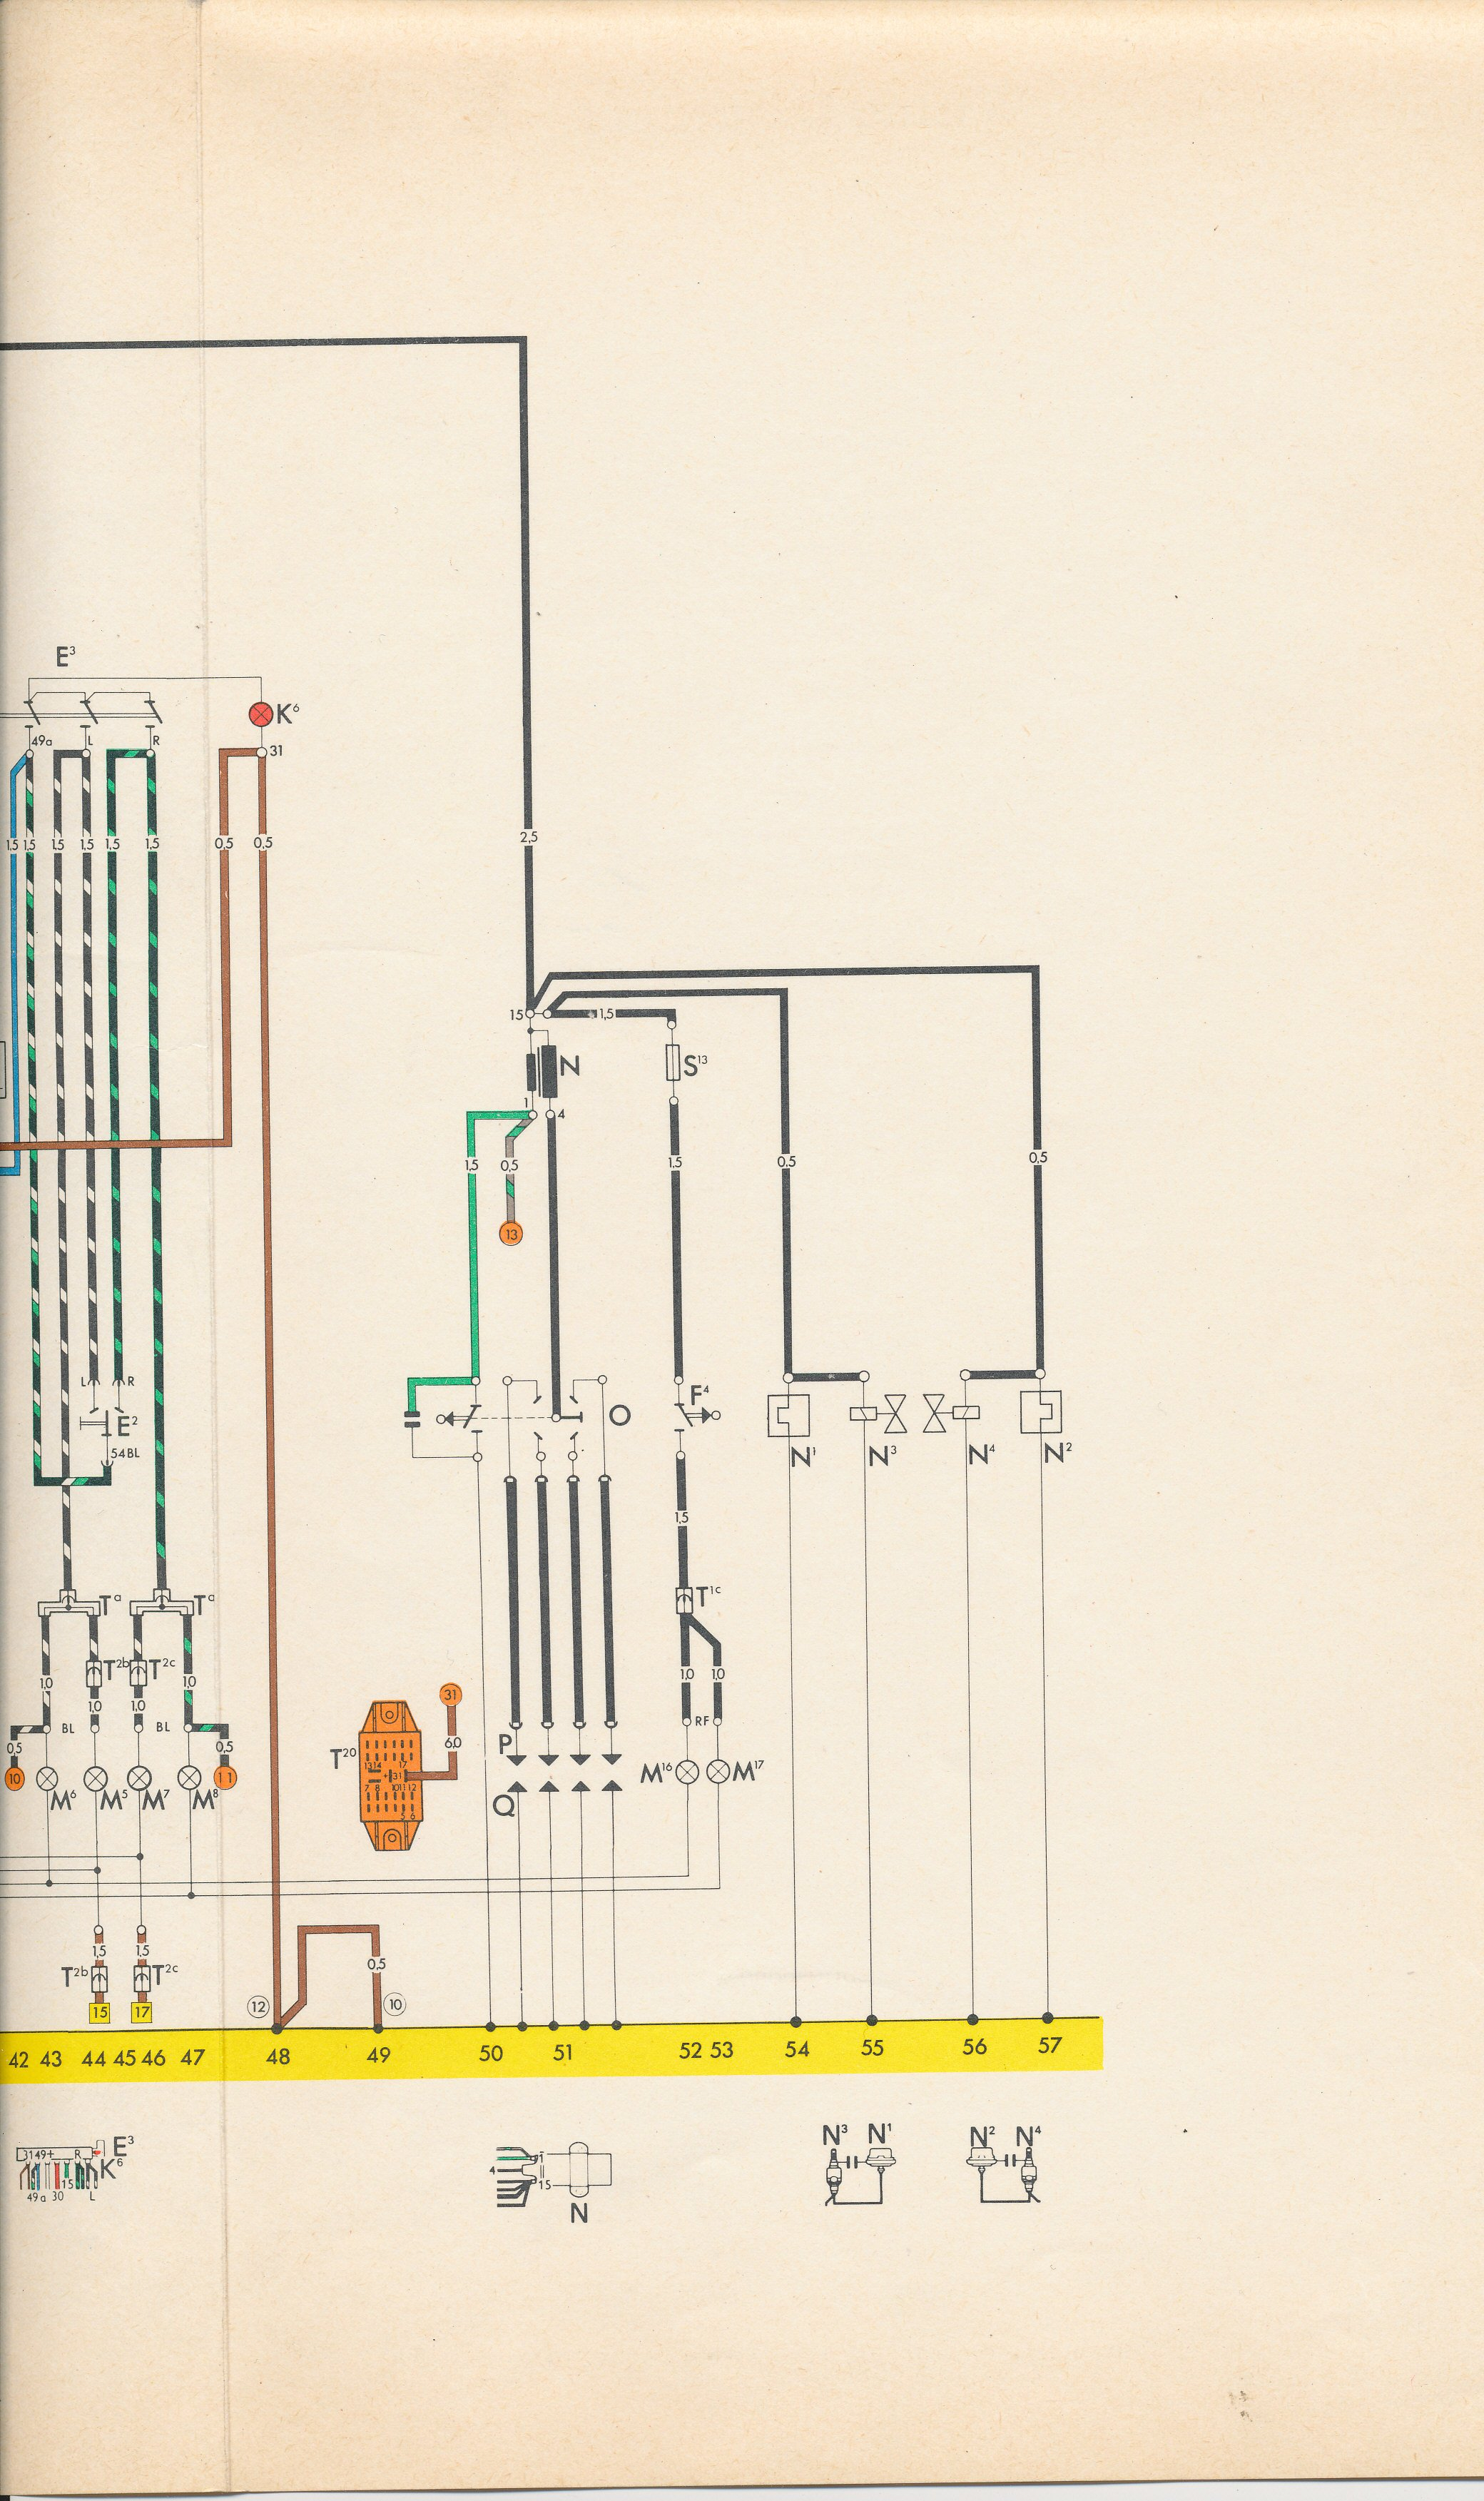 1966 vw bus wiring diagram kenwood kdc 152 karmann ghia harness get